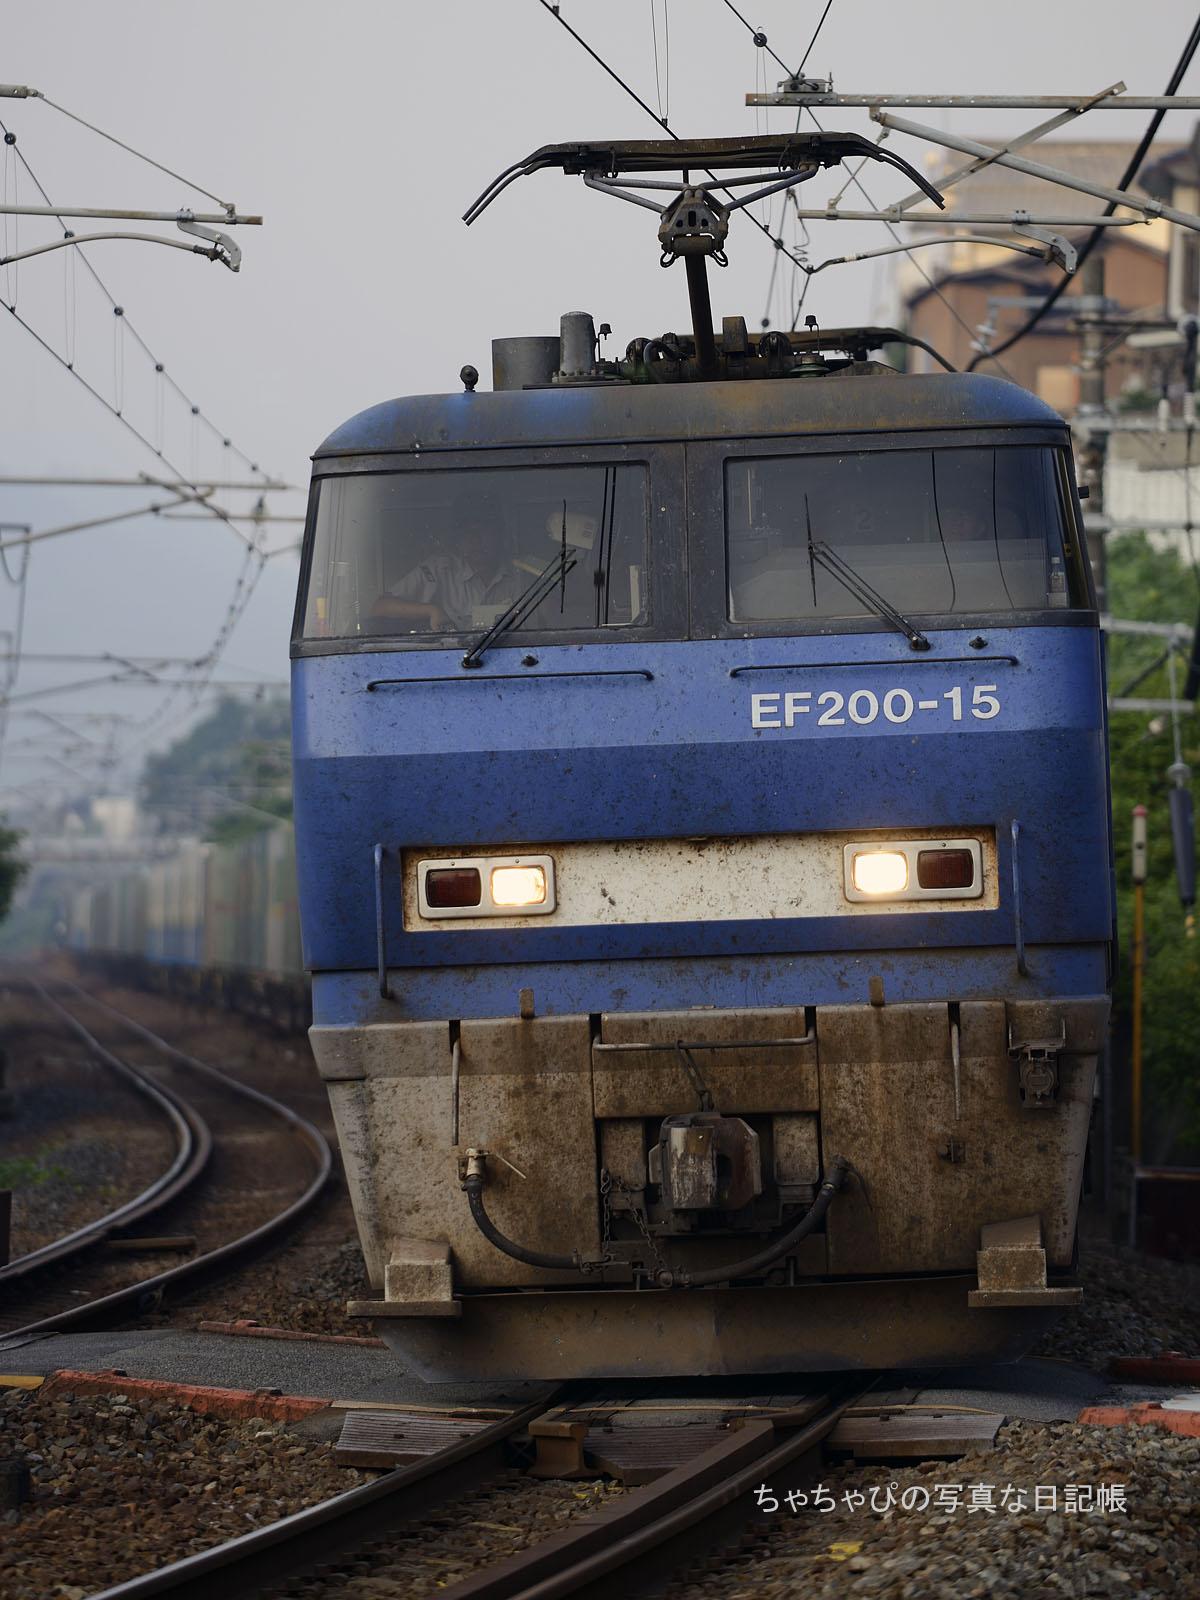 1050レ、EF200-15 中野東駅~瀬野駅